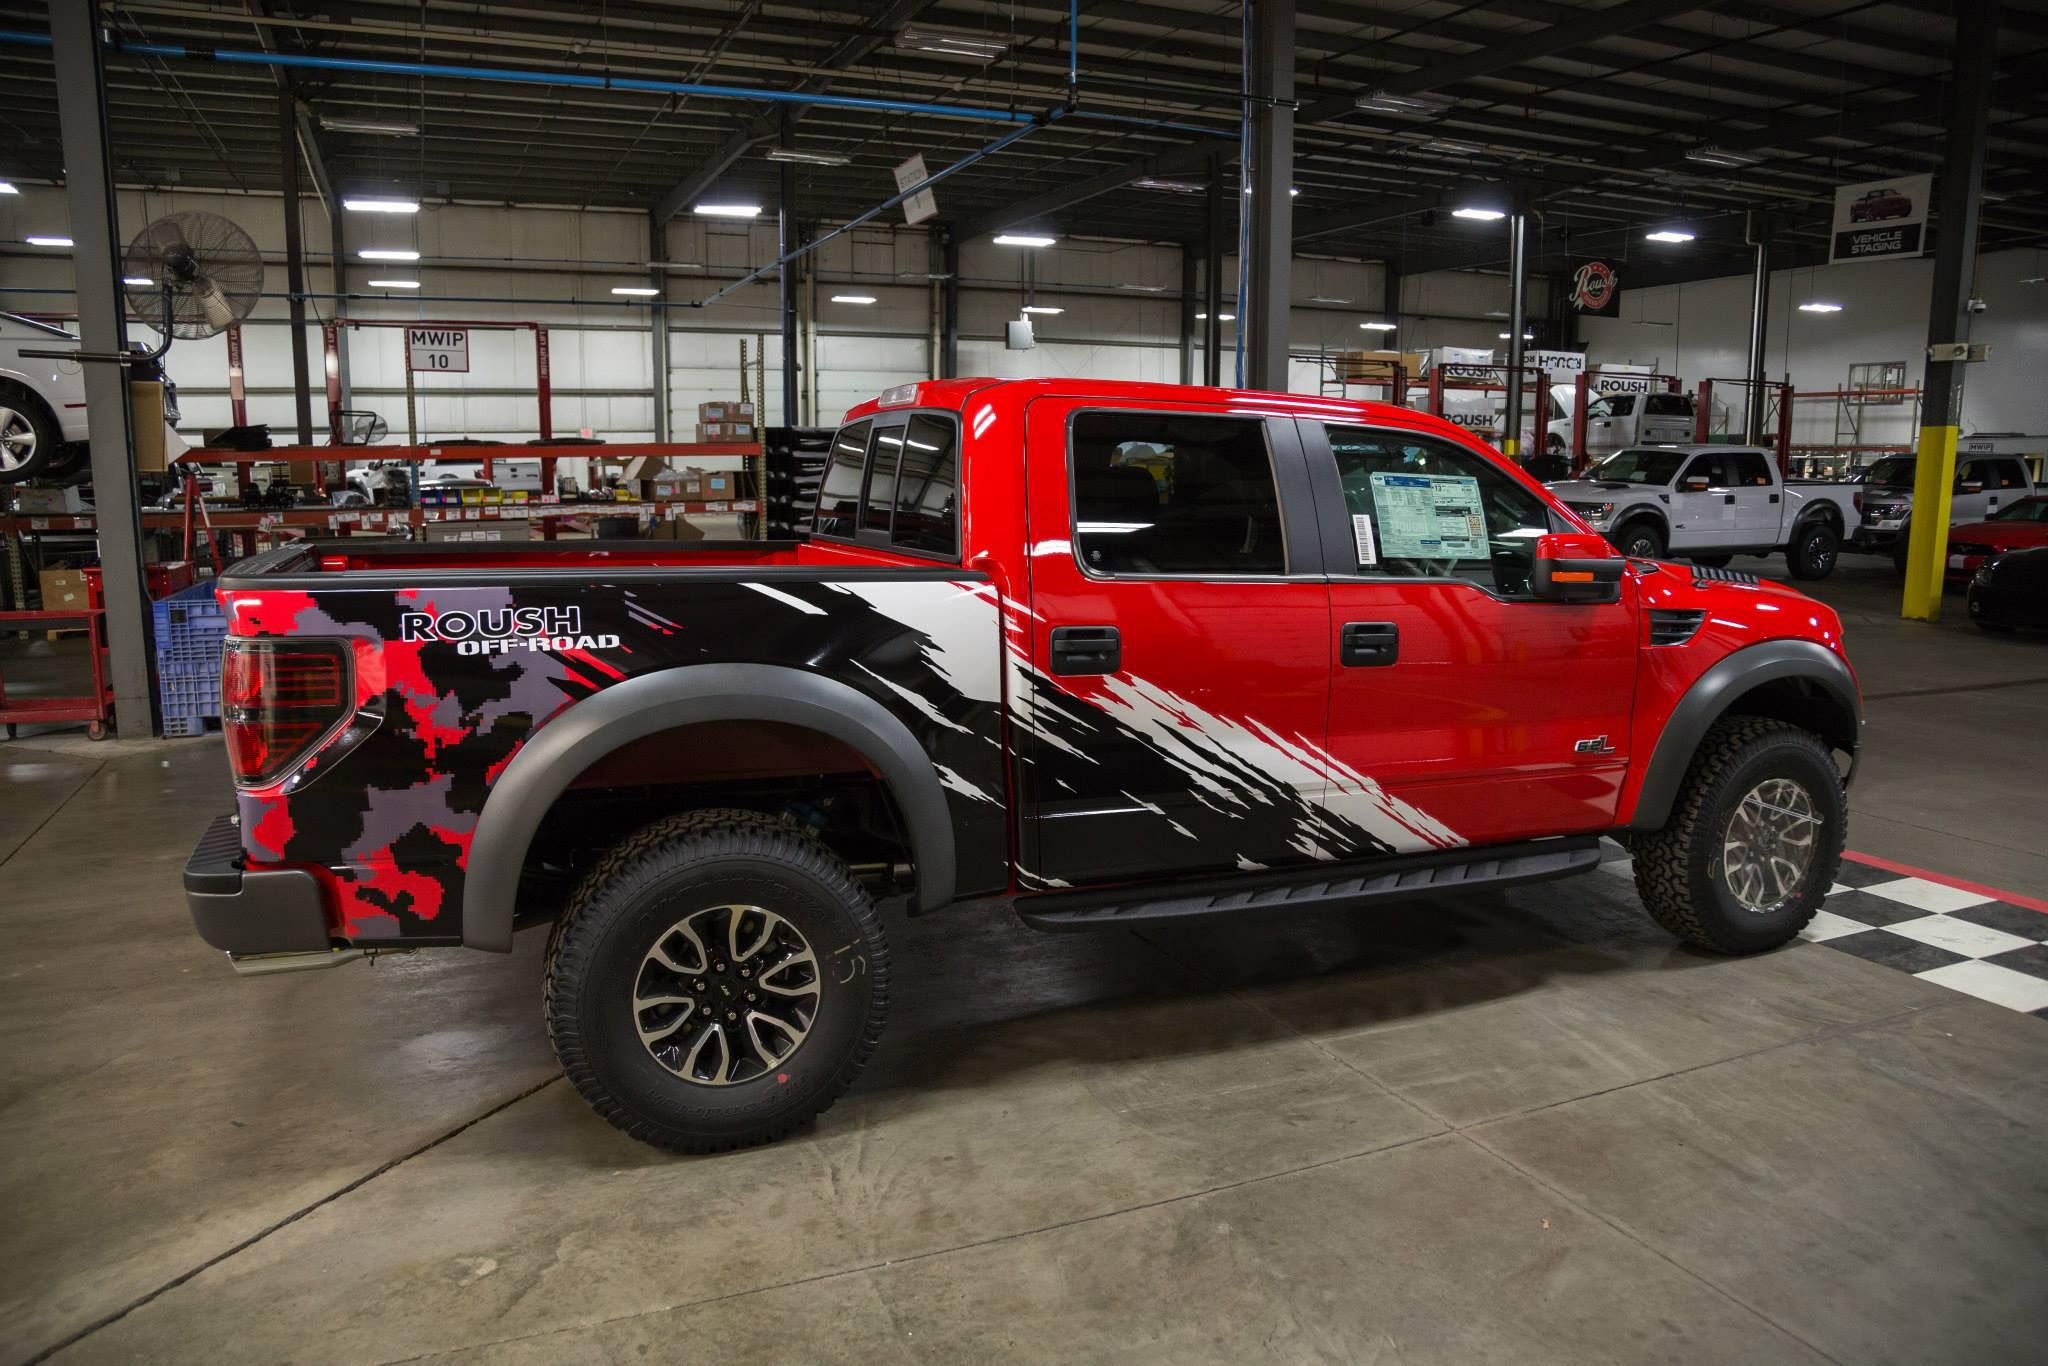 2014 Ford Raptor Roush For Sale In Texas | Autos Weblog